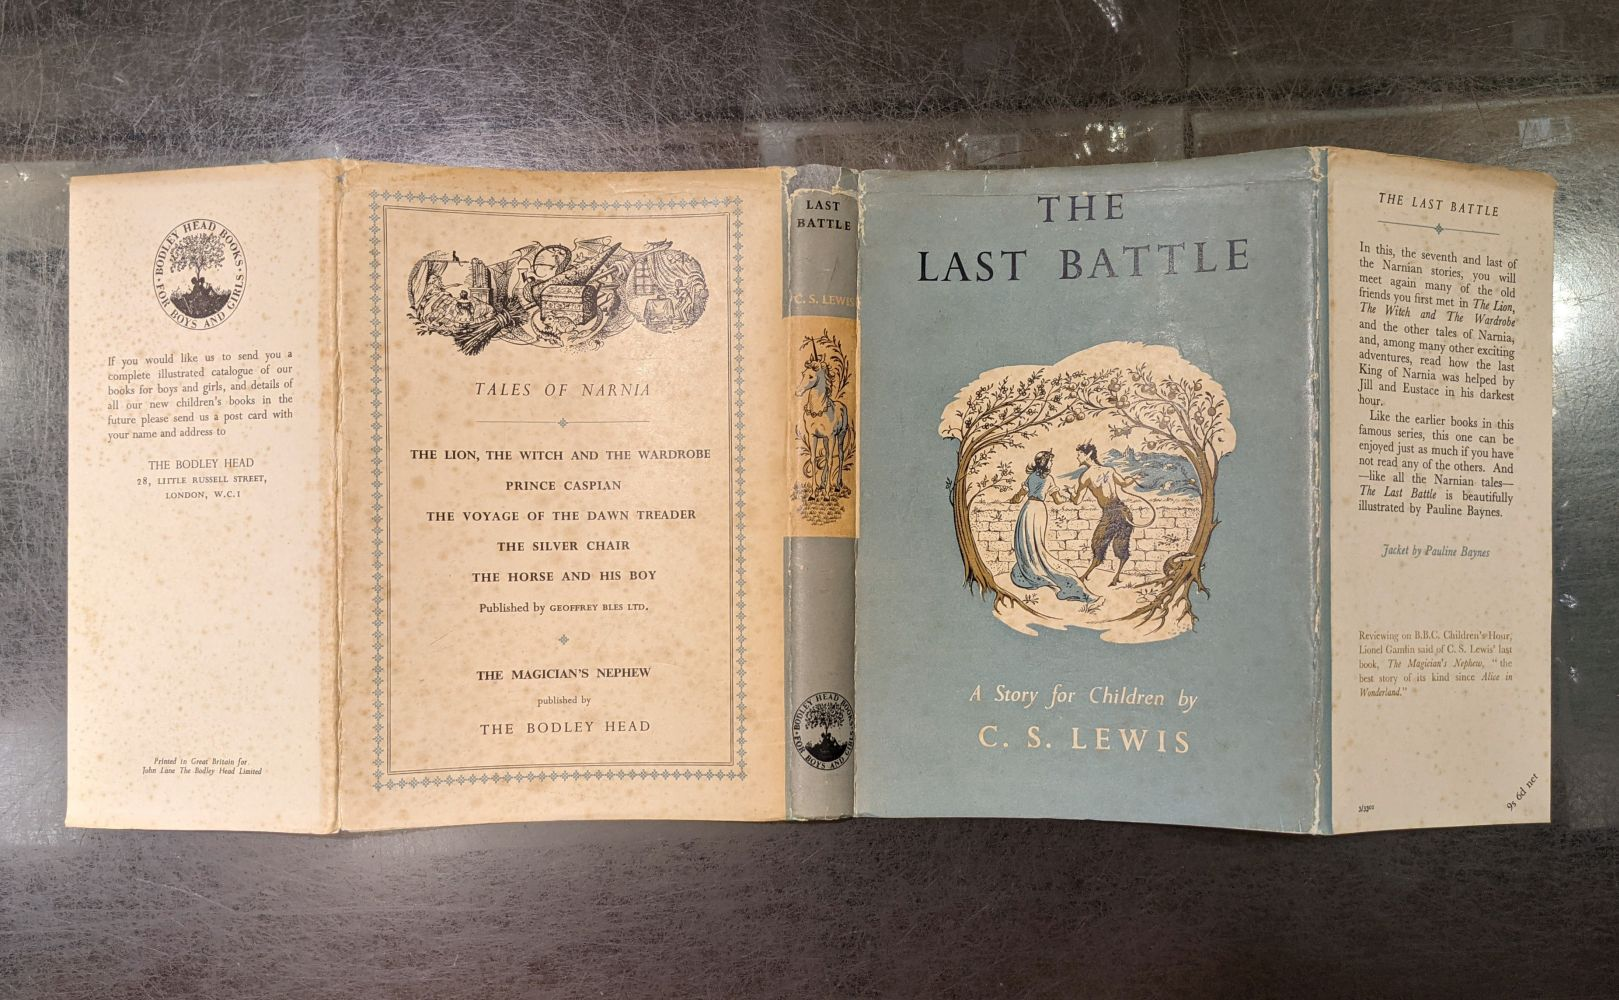 Lewis (C.S.) The Last Battle, 1st edition, 1956 - Image 3 of 9